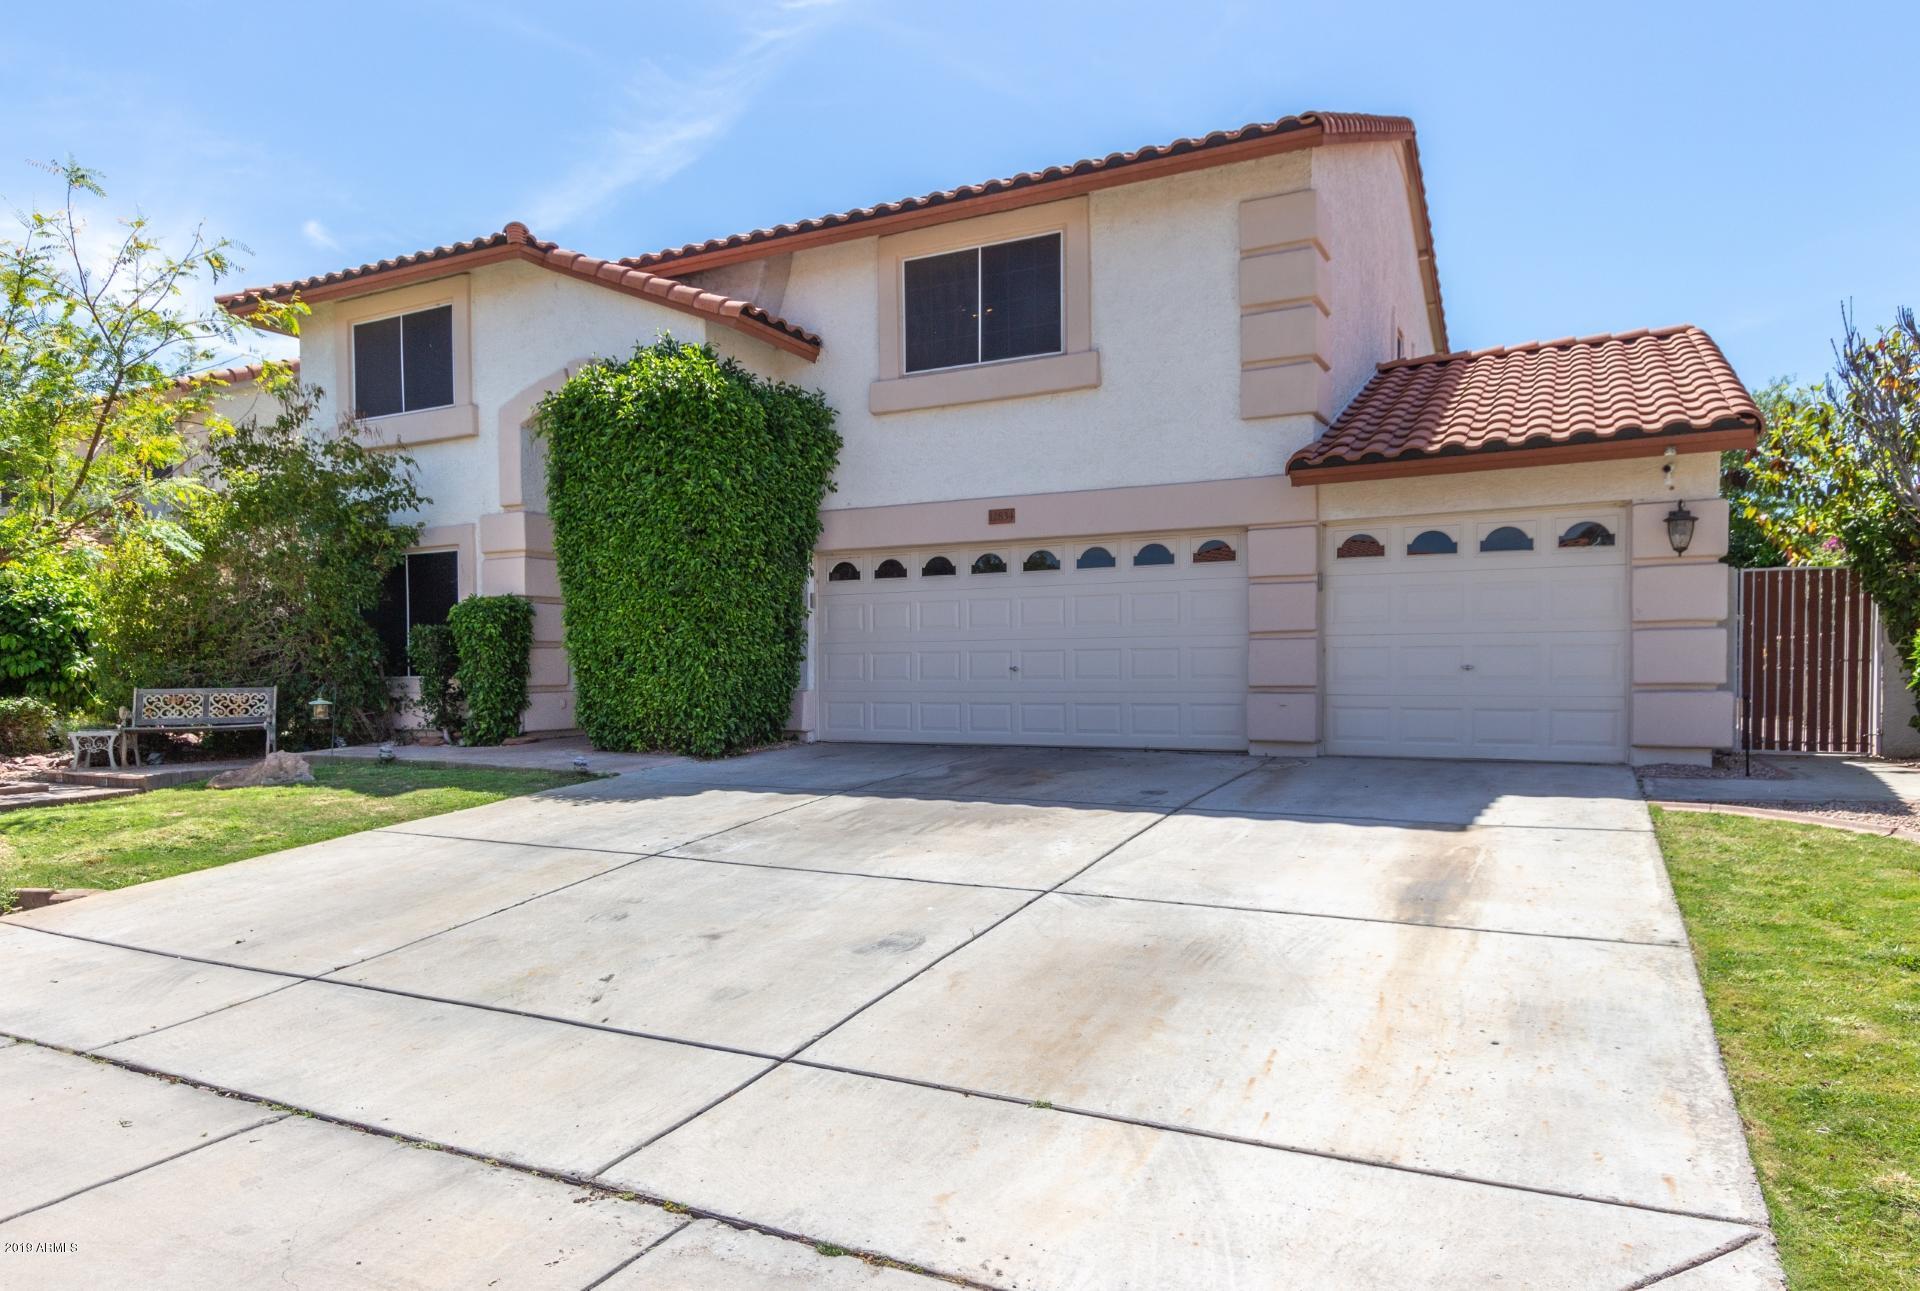 Photo of 12834 N 57TH Avenue, Glendale, AZ 85304